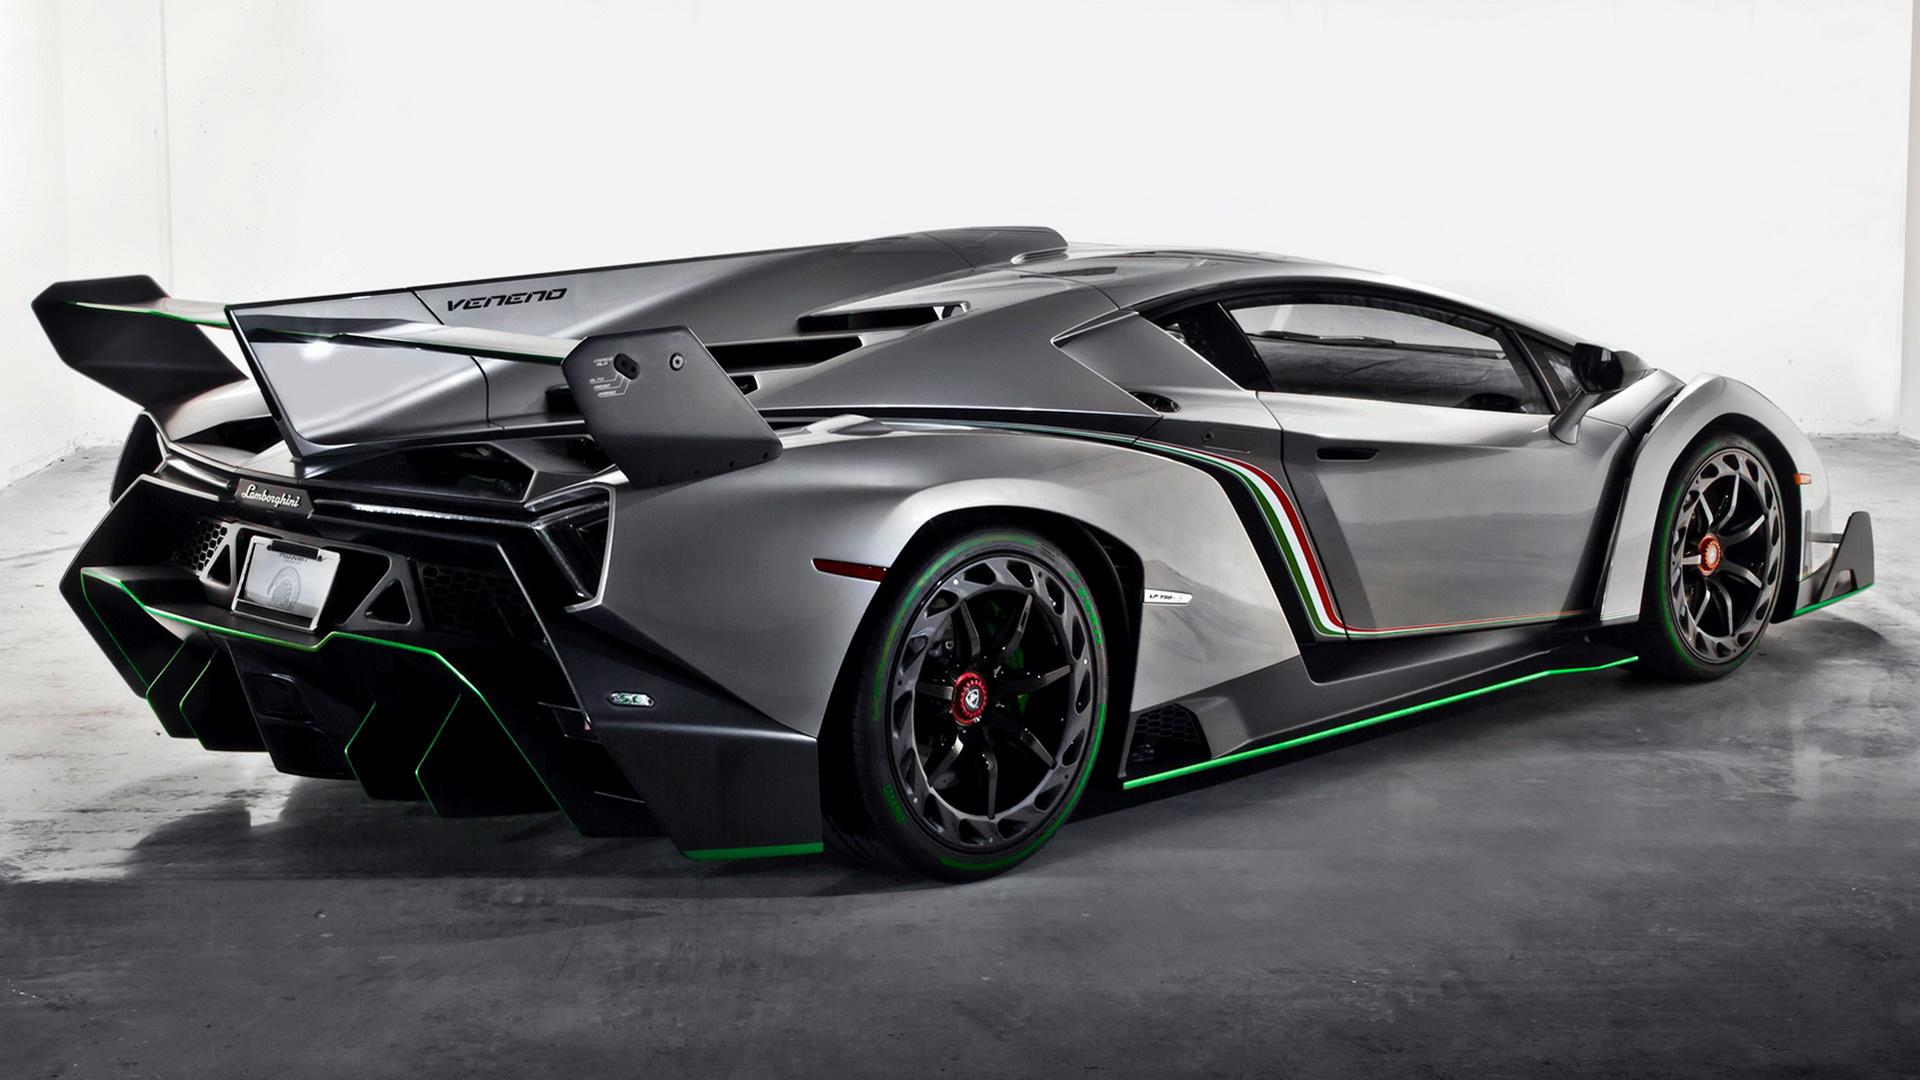 2013 Lamborghini Veneno Us Fondos De Pantalla E Imágenes